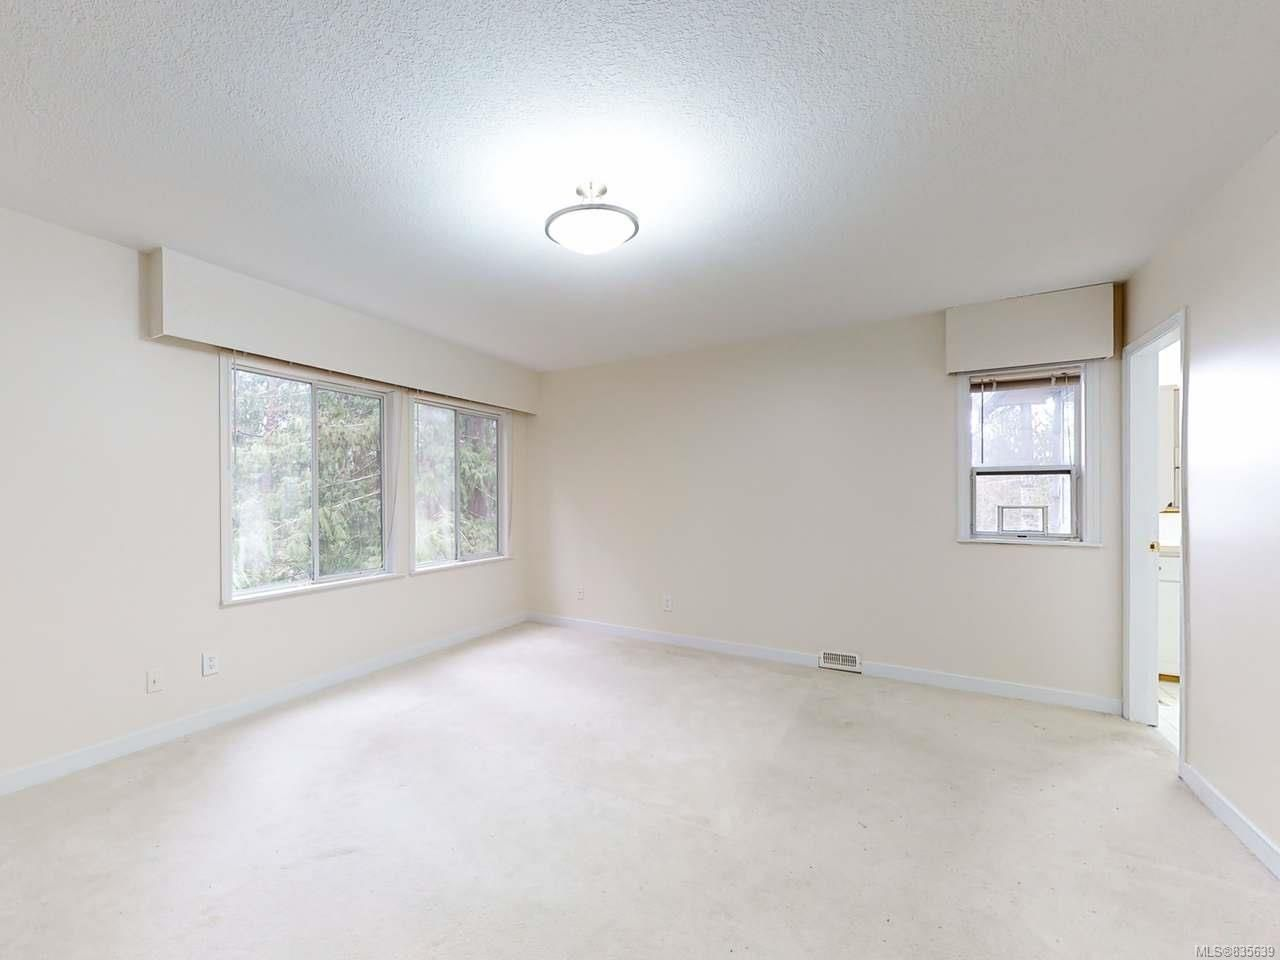 Photo 25: Photos: 9657 Faber Rd in PORT ALBERNI: PA Sproat Lake House for sale (Port Alberni)  : MLS®# 835639